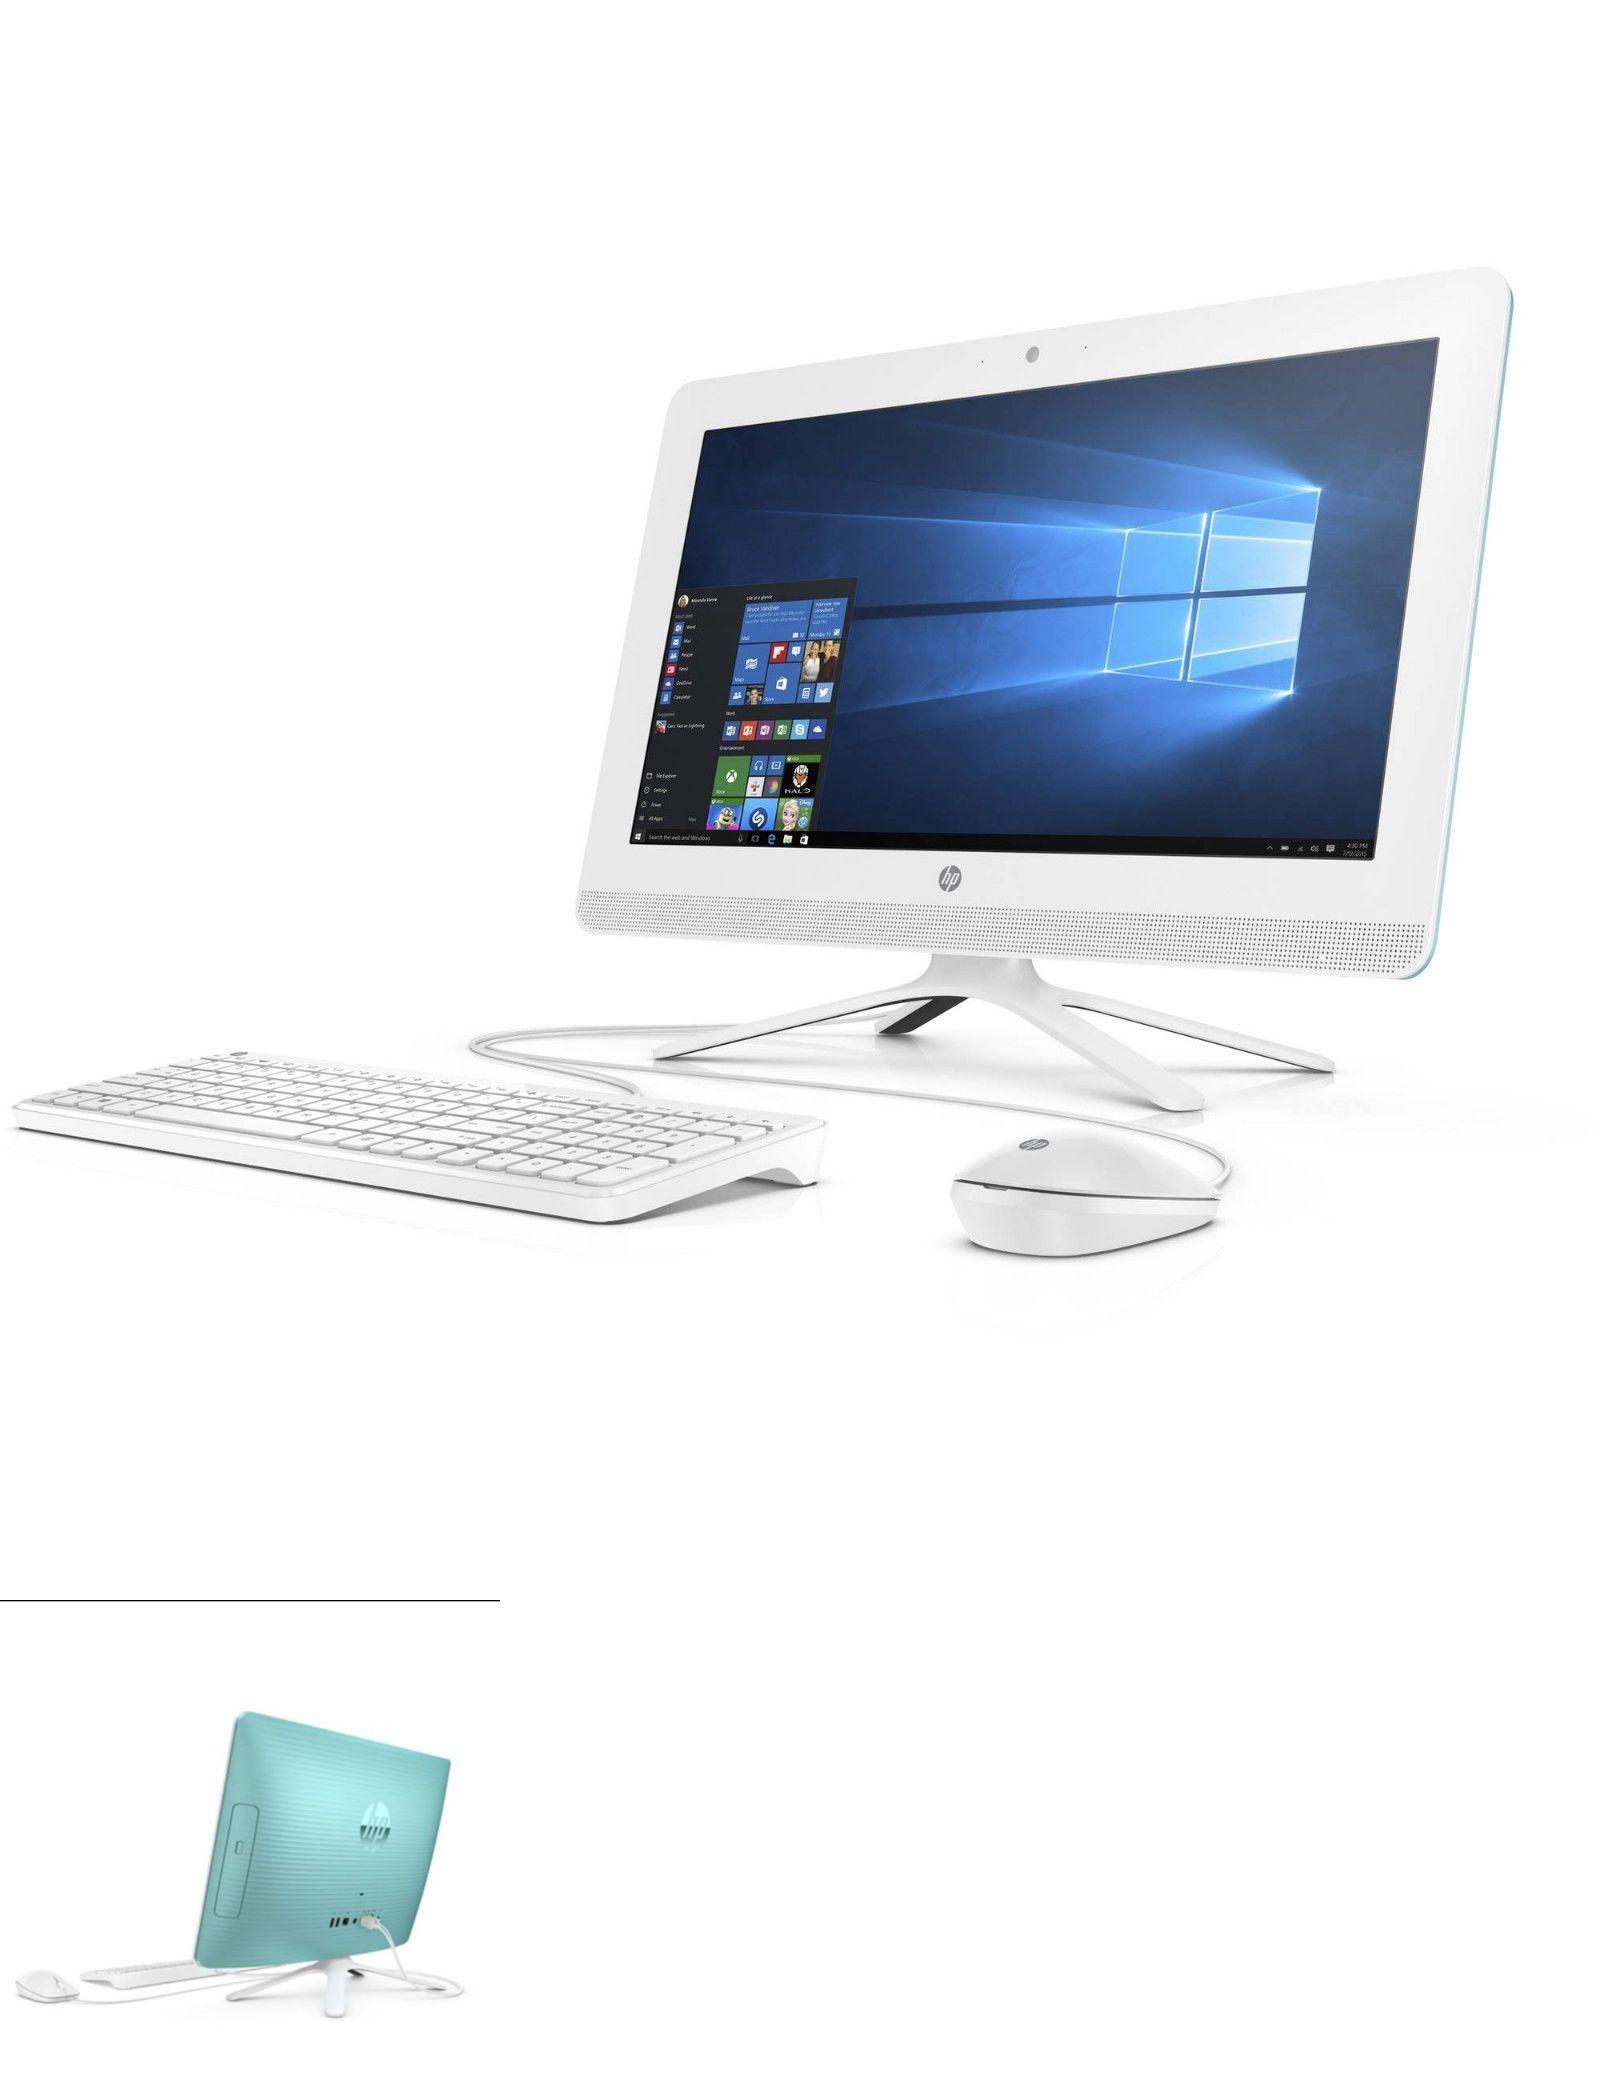 Hp Windows 10 All In One Desktop W 19 5 Screen 4gb Ram 500gb Hdd Windows 10 Desktop Pc Hdd